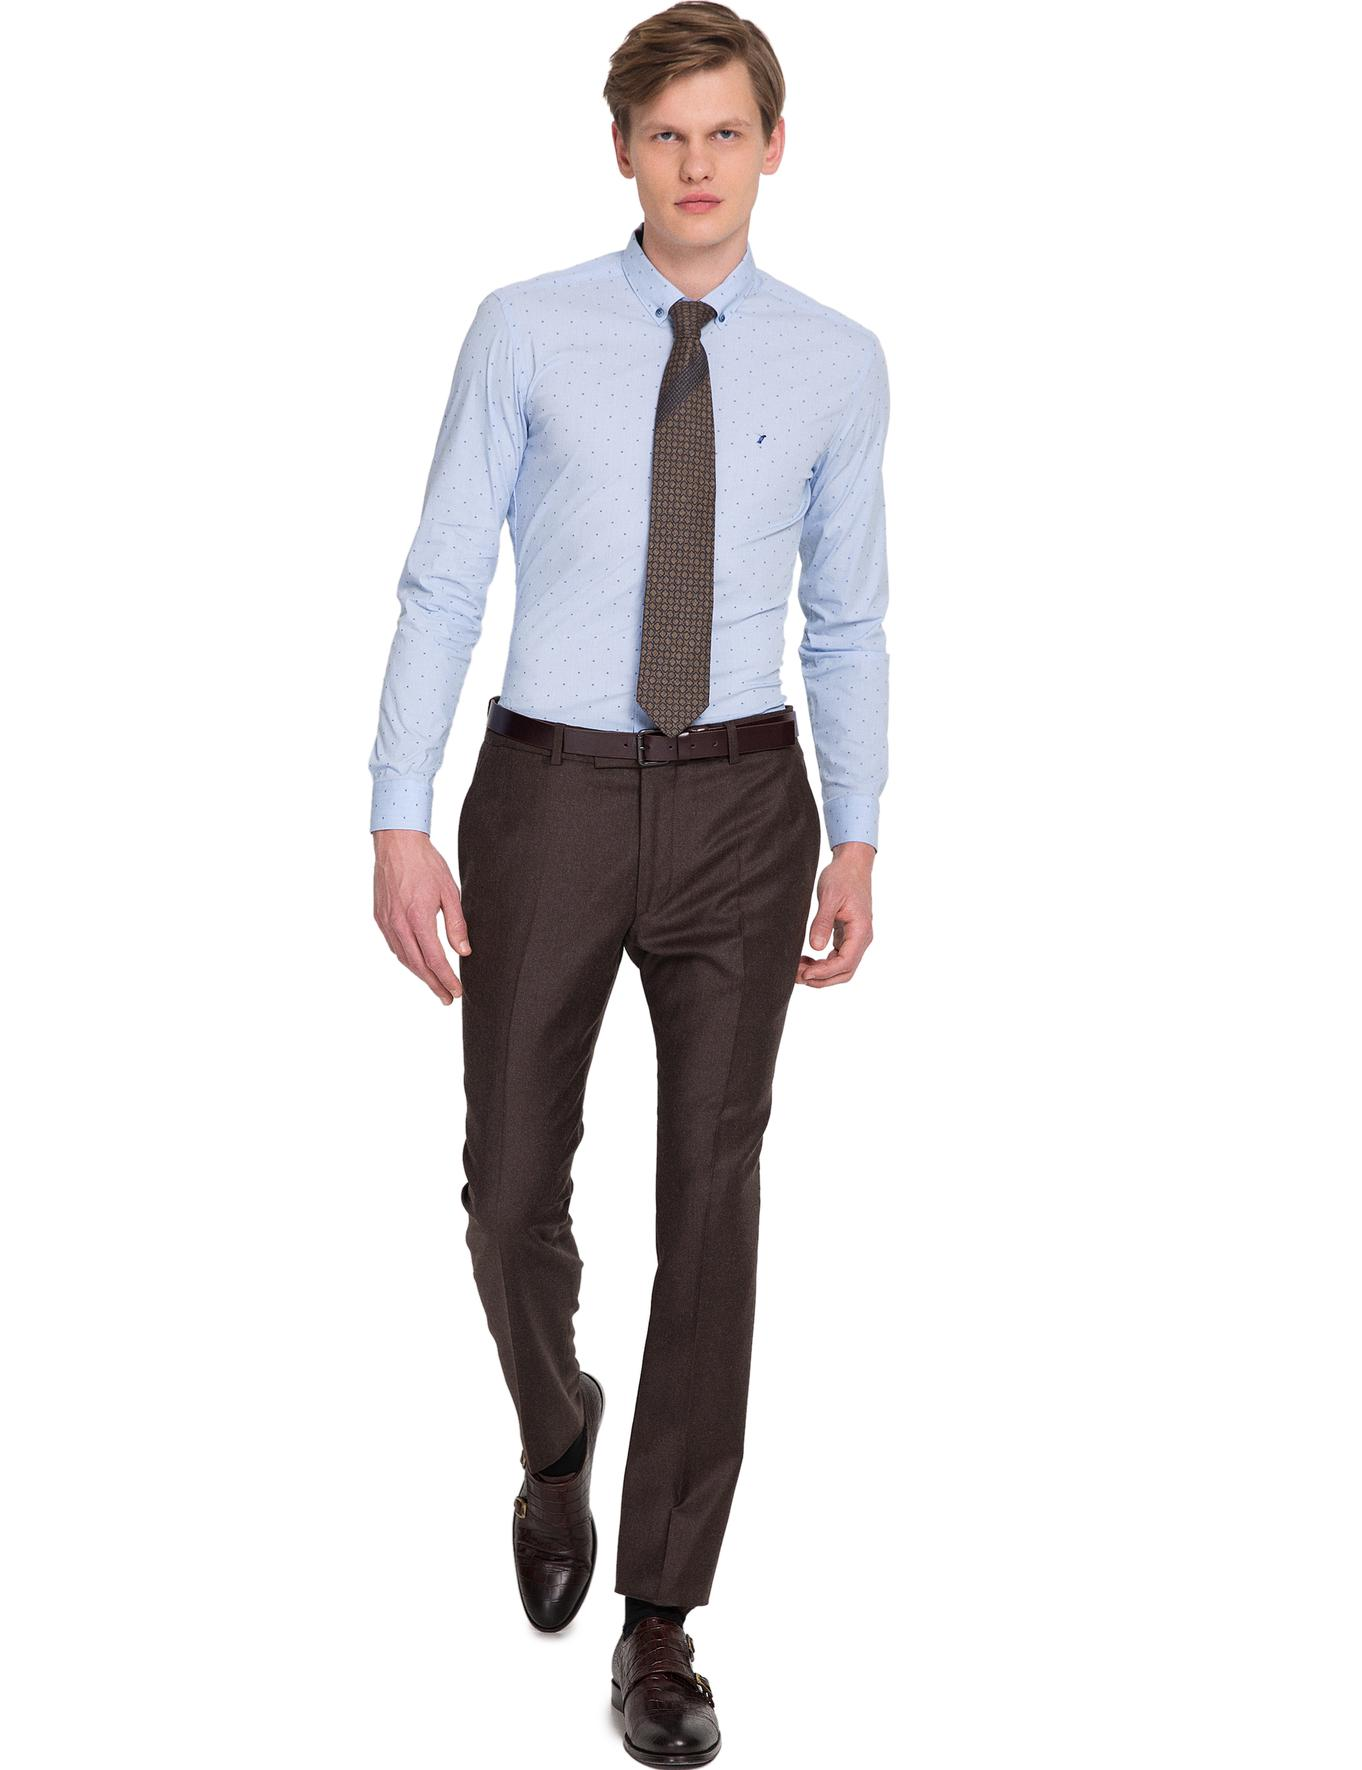 Açık Mavi Slim Fit Gömlek - 50174255005